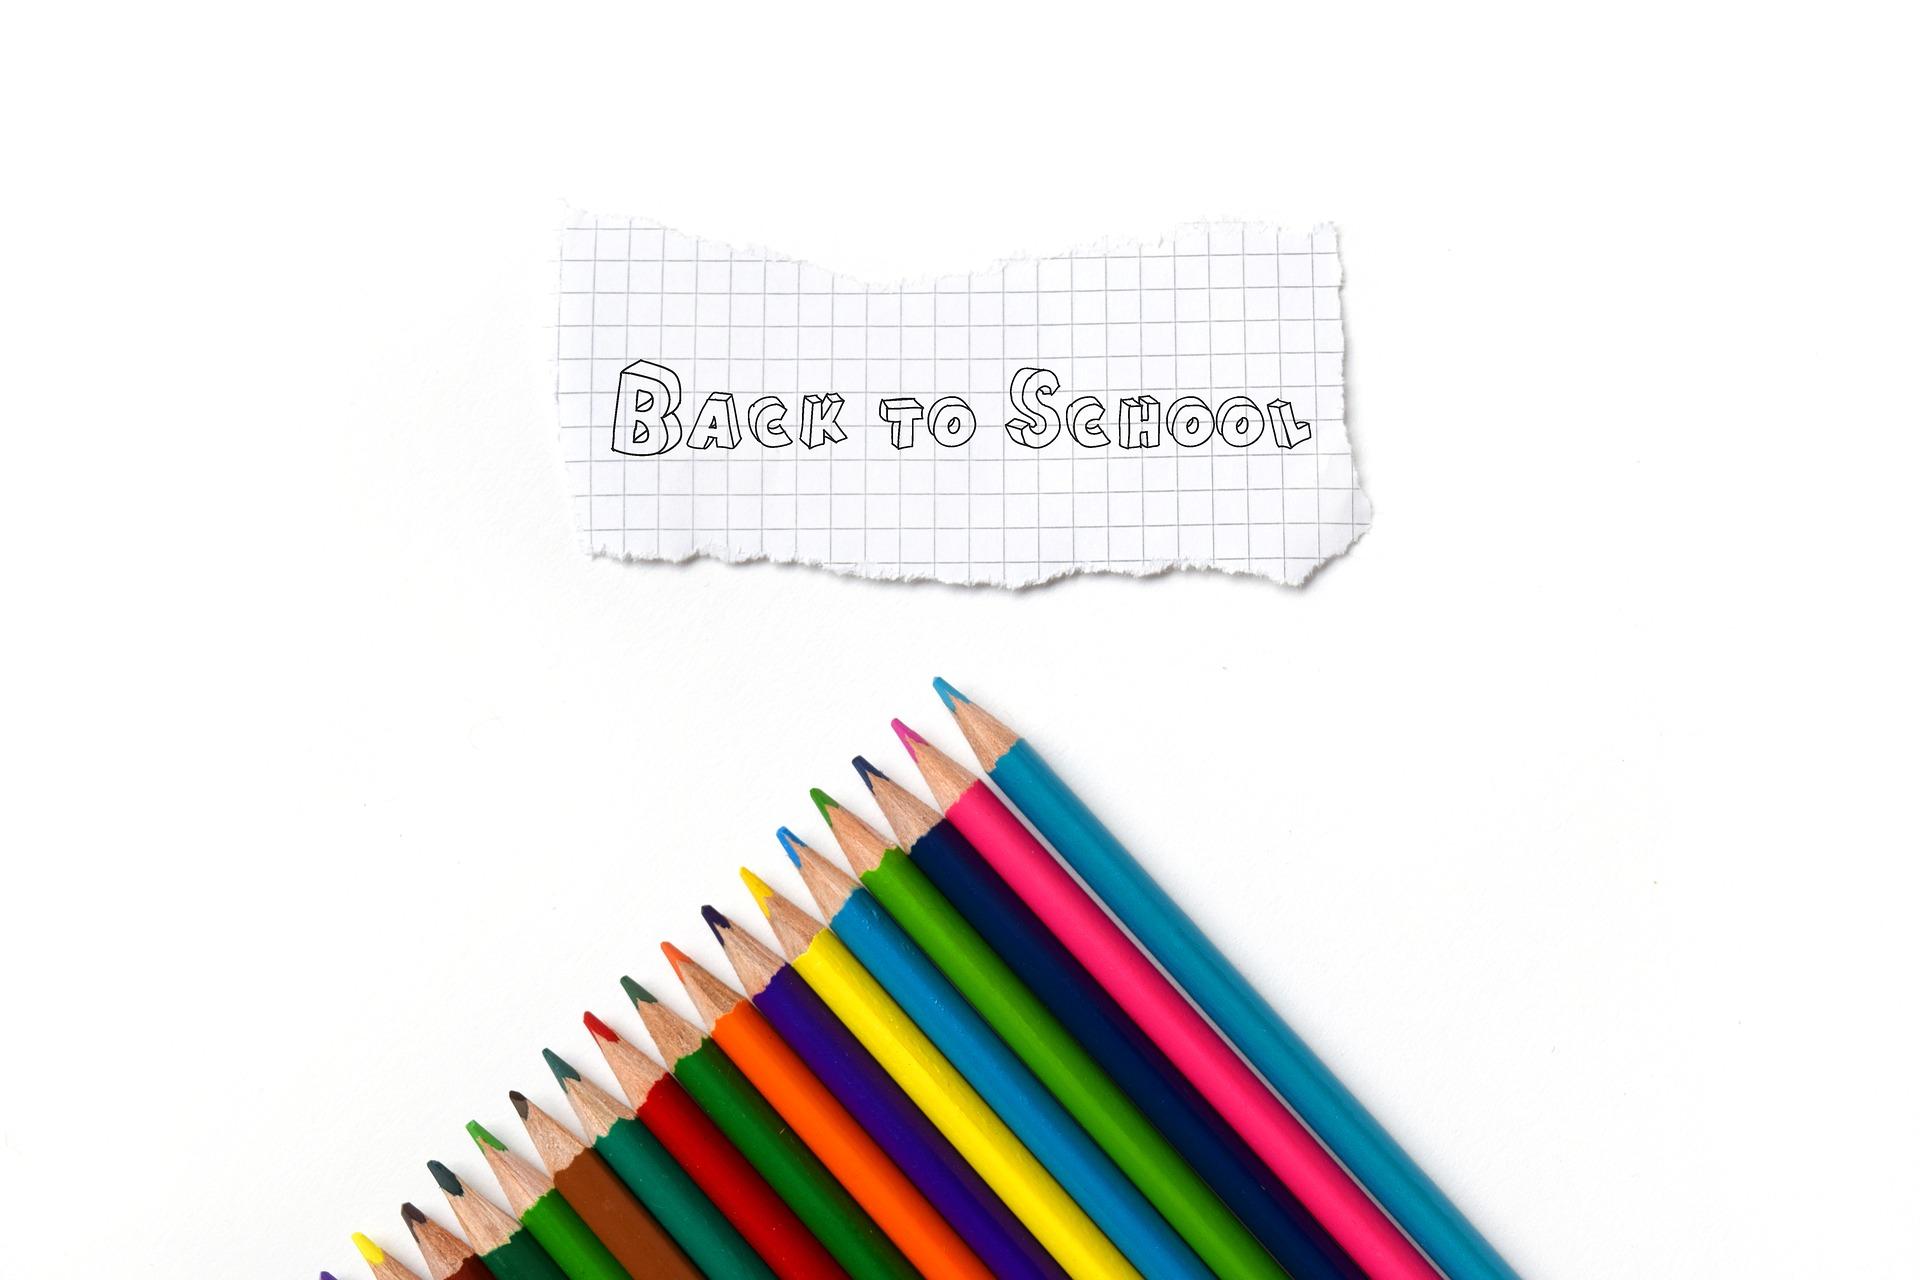 back-to-school-1576795_1920.jpg